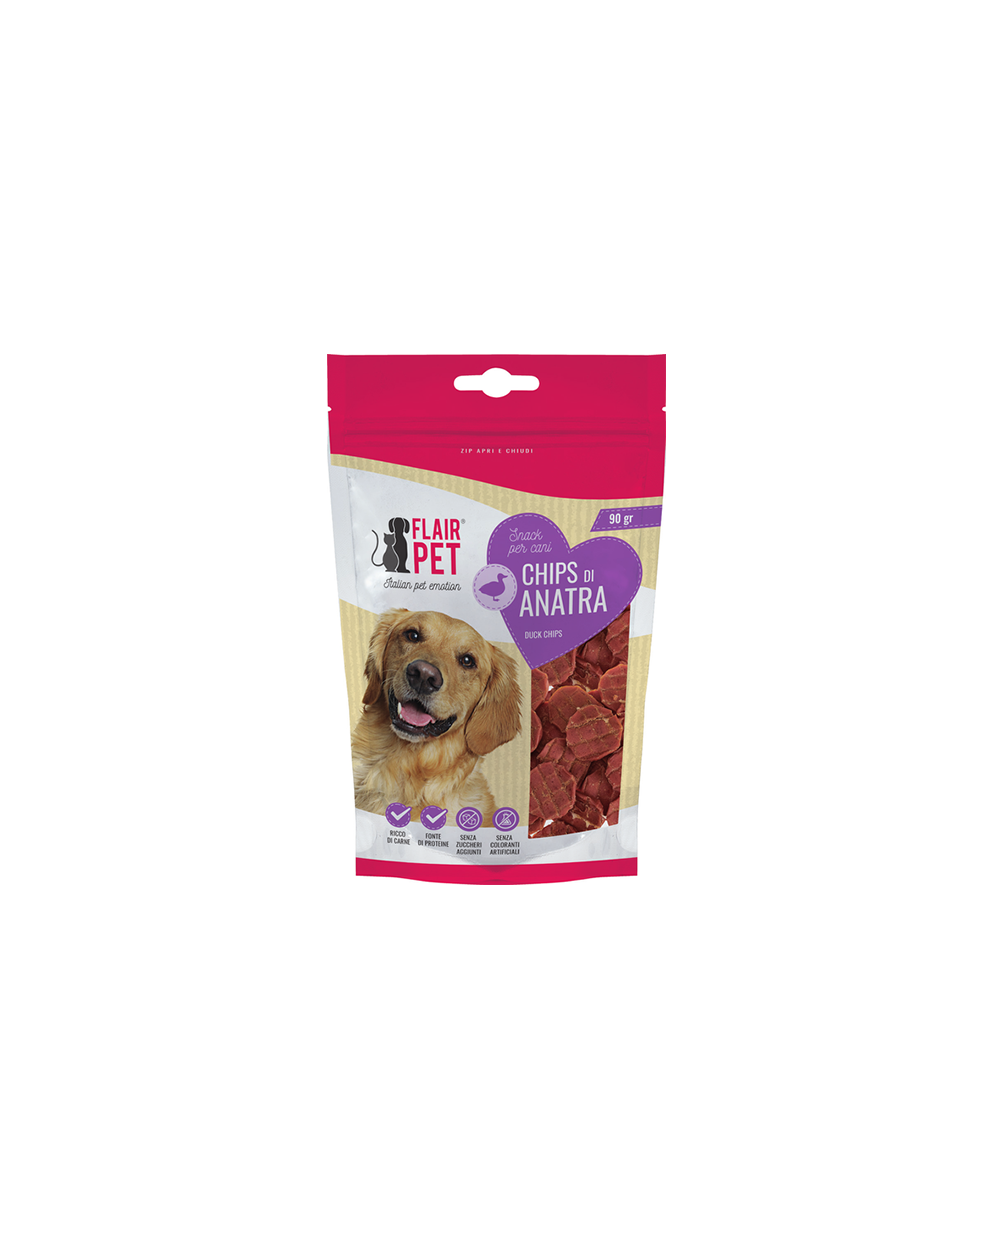 Flair Pet Snack Naturali Chips di Anatra 90 g